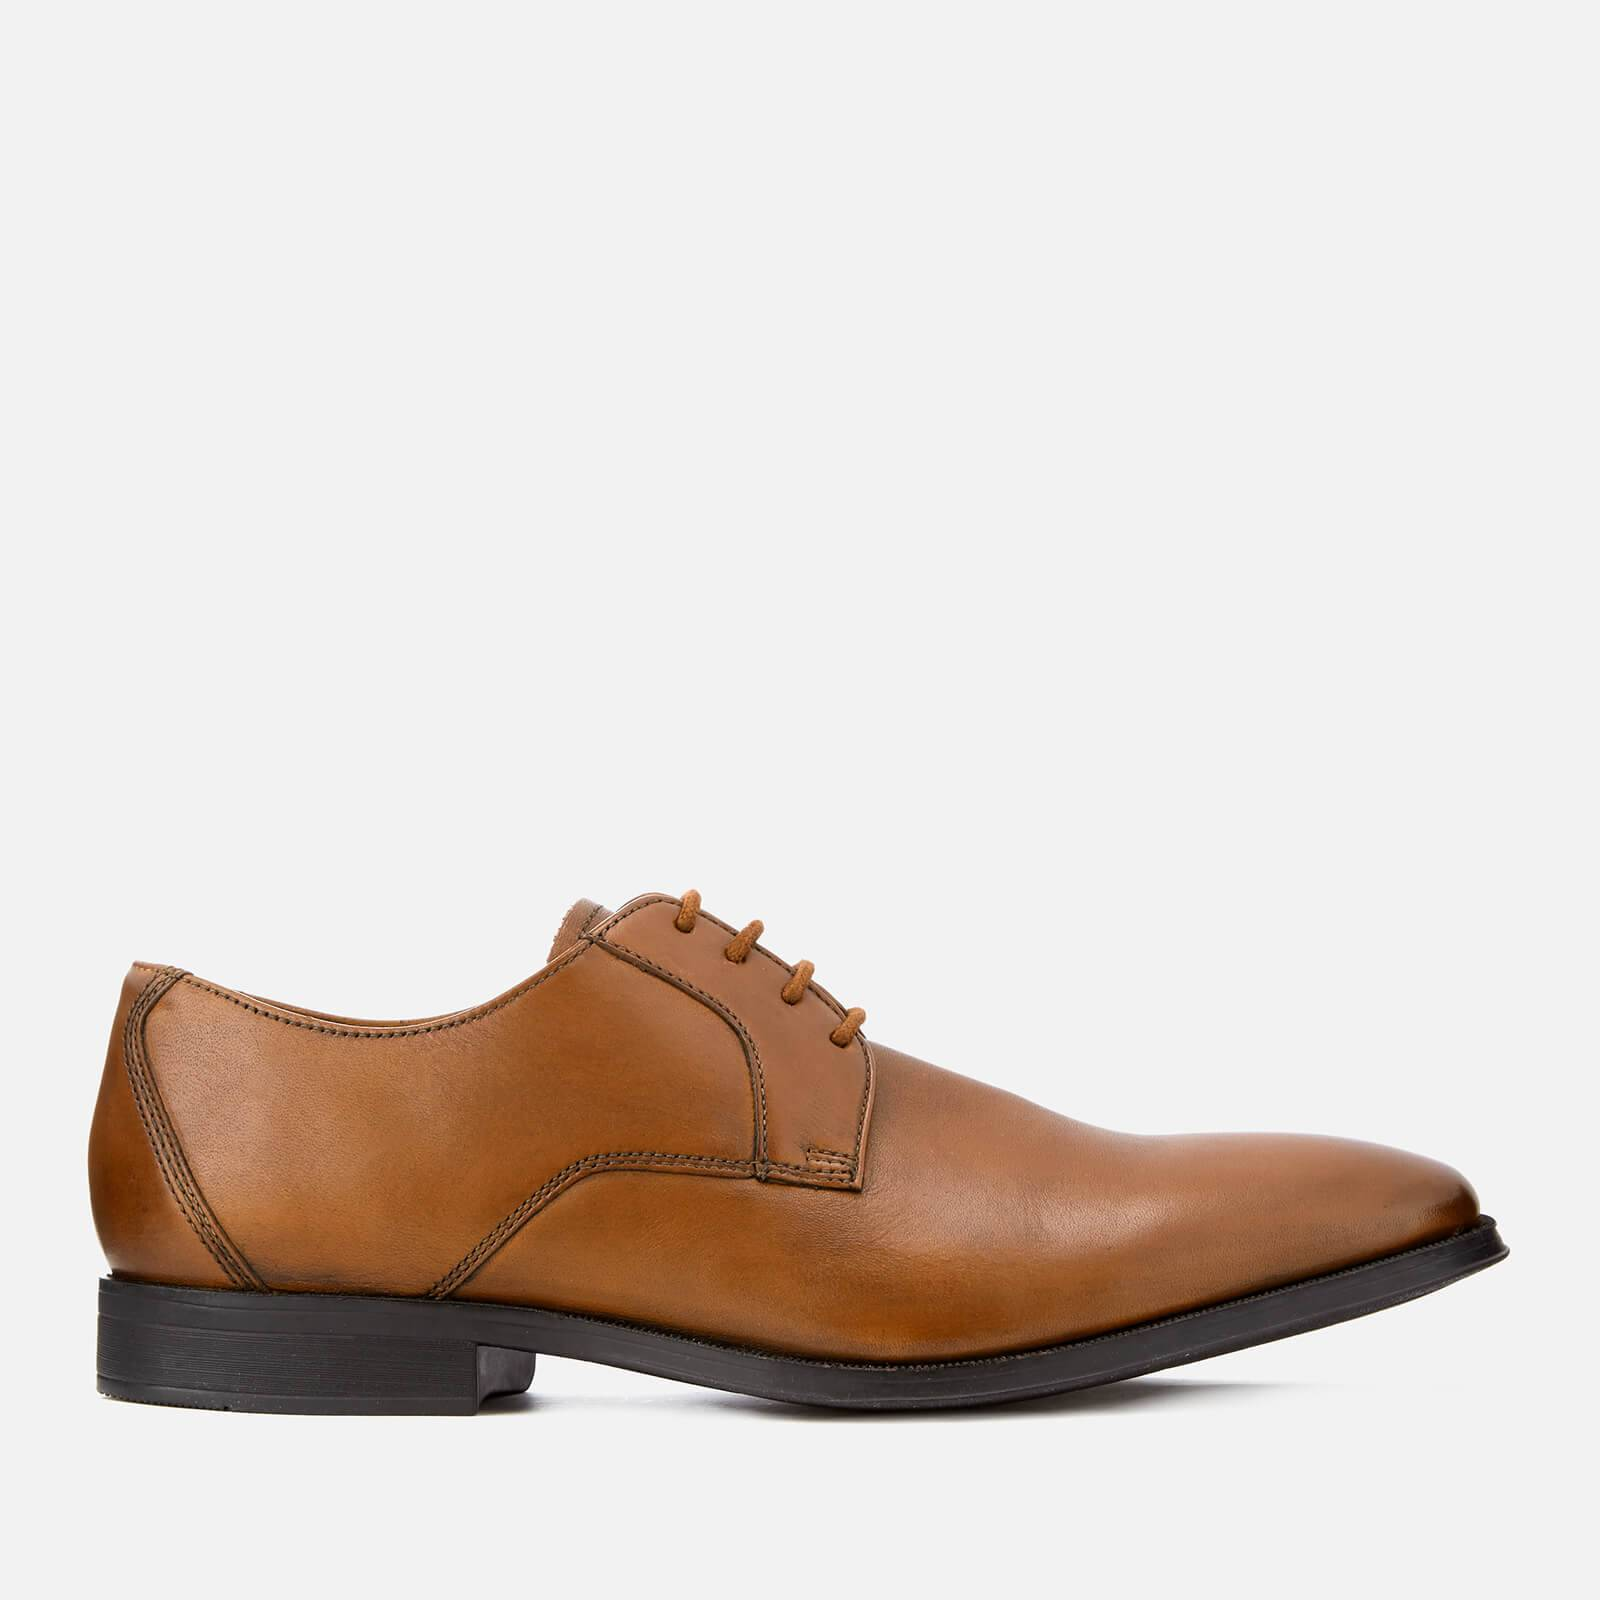 Clarks Men's Gilman Lace Leather Derby Shoes - Dark Tan - UK 11 - Tan